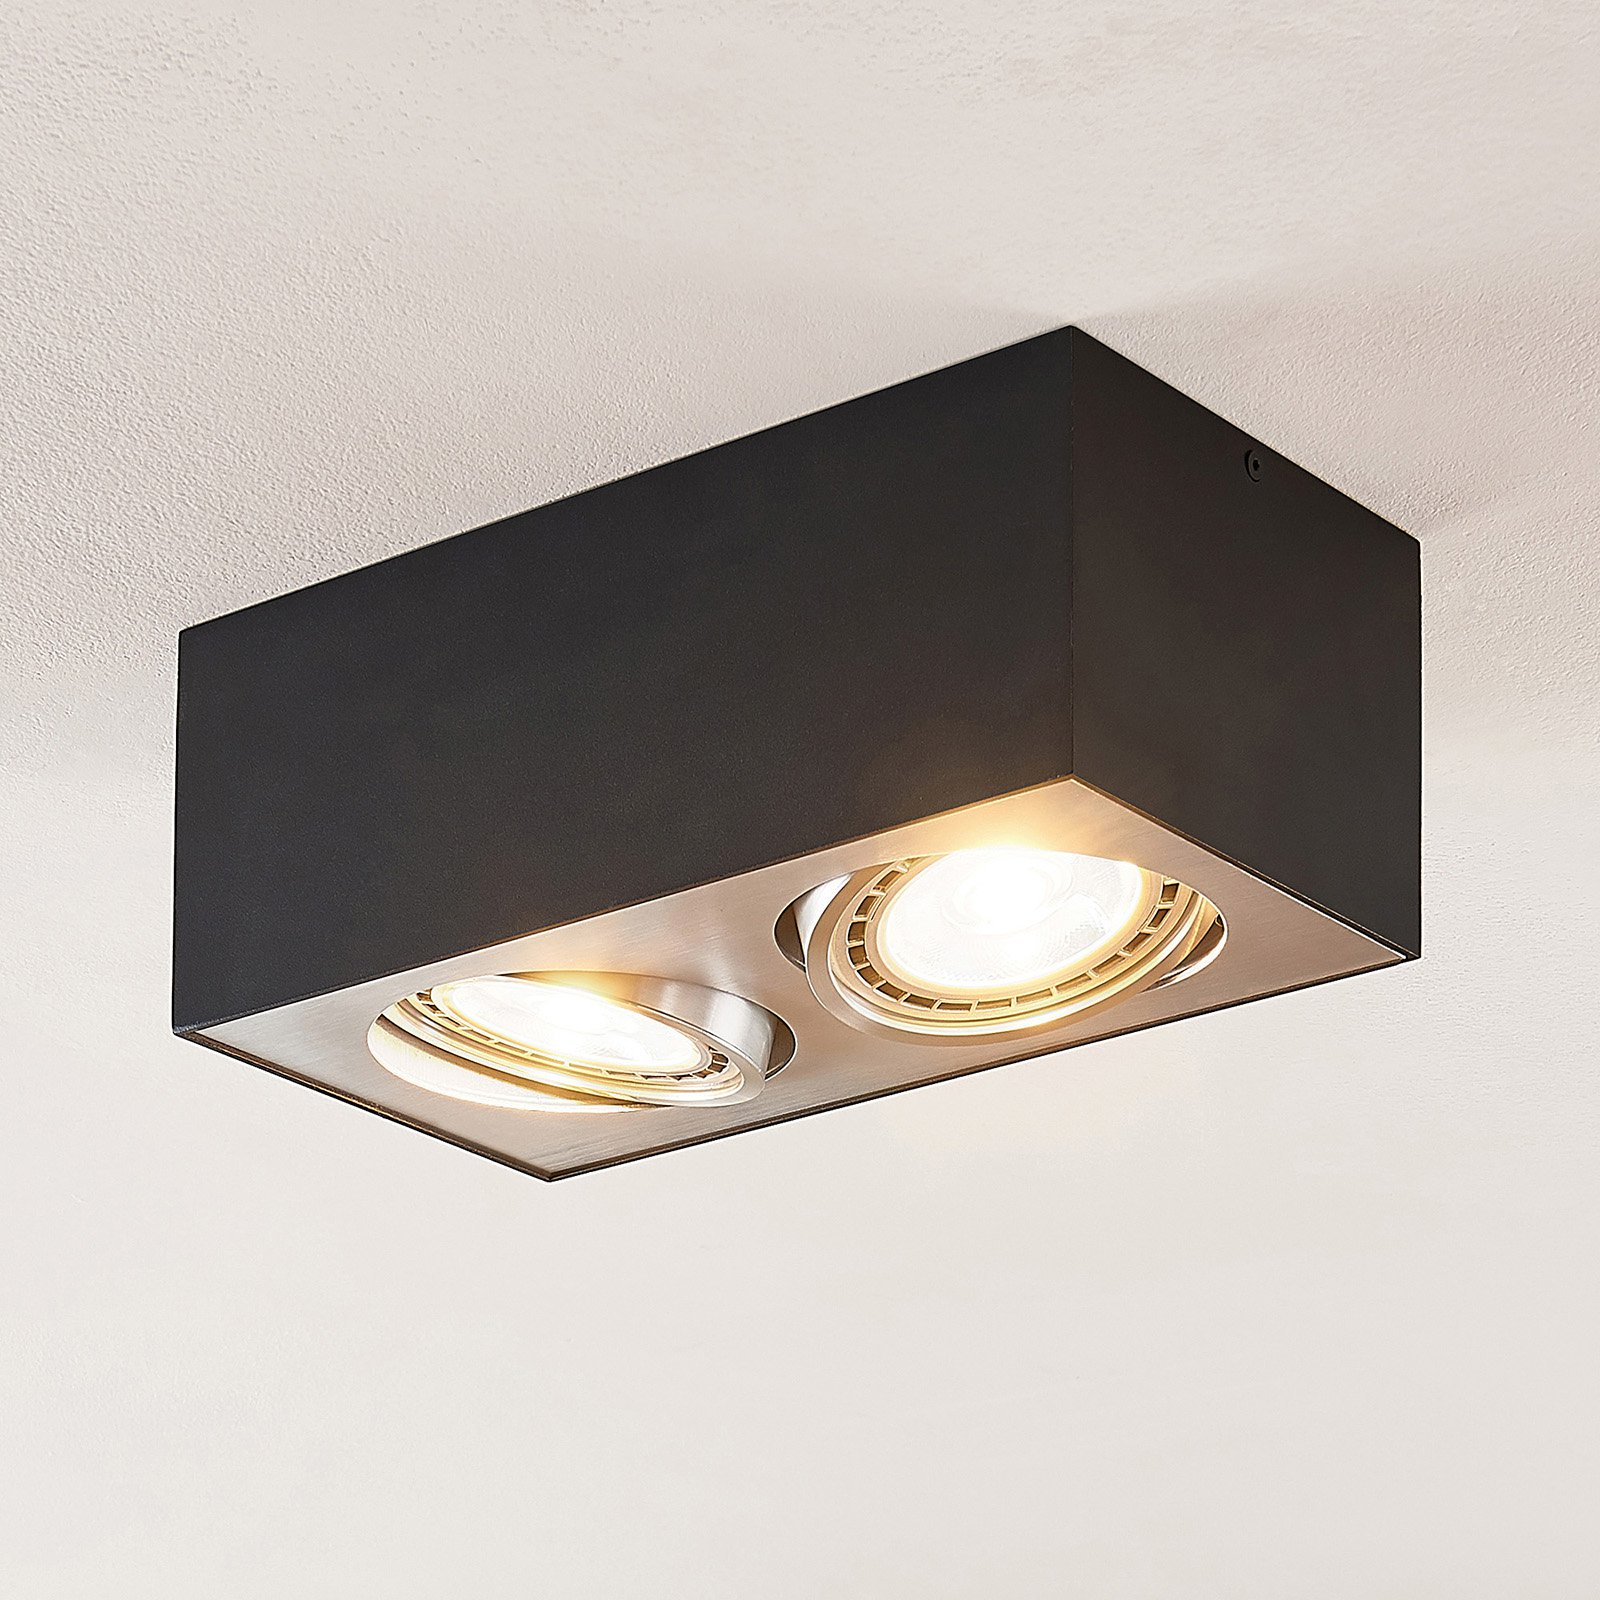 Arccio Dwight LED-taklampe i svart, 2 lyskilder